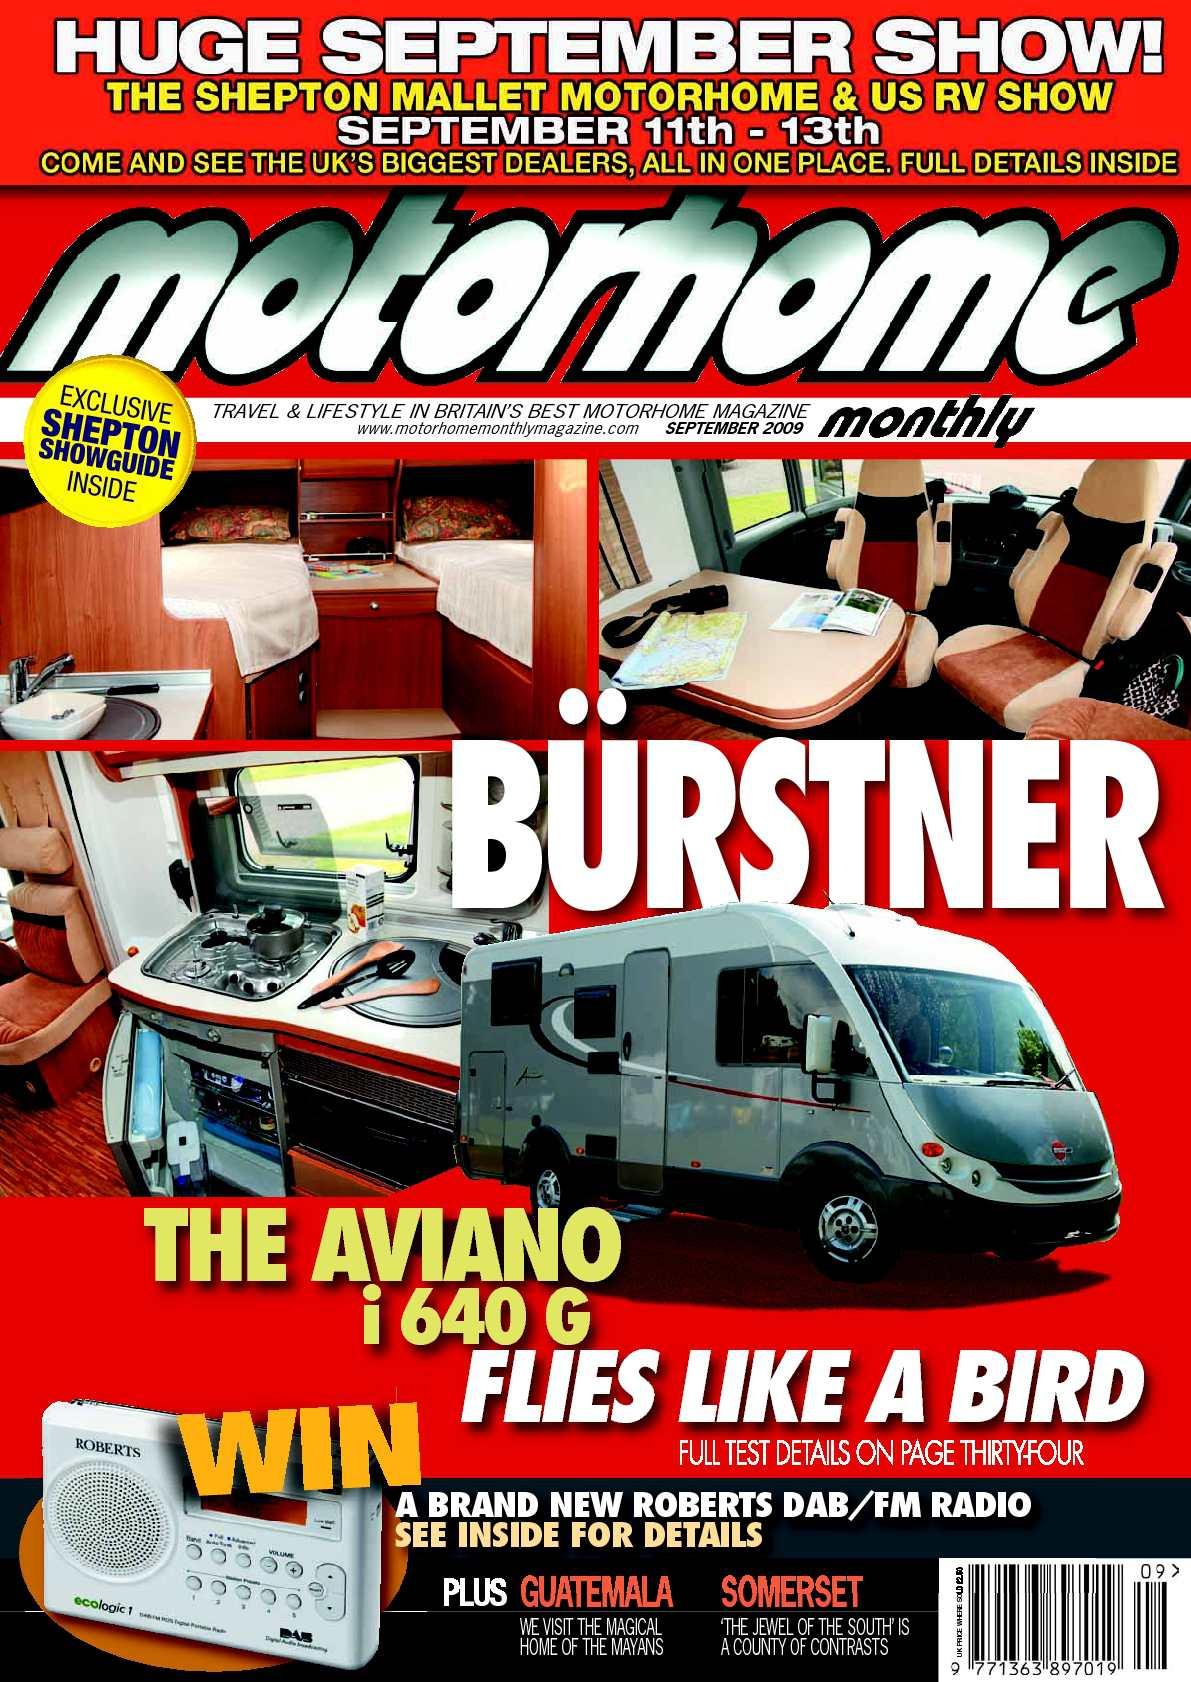 calameo september 2009 motorhome monthly magazine